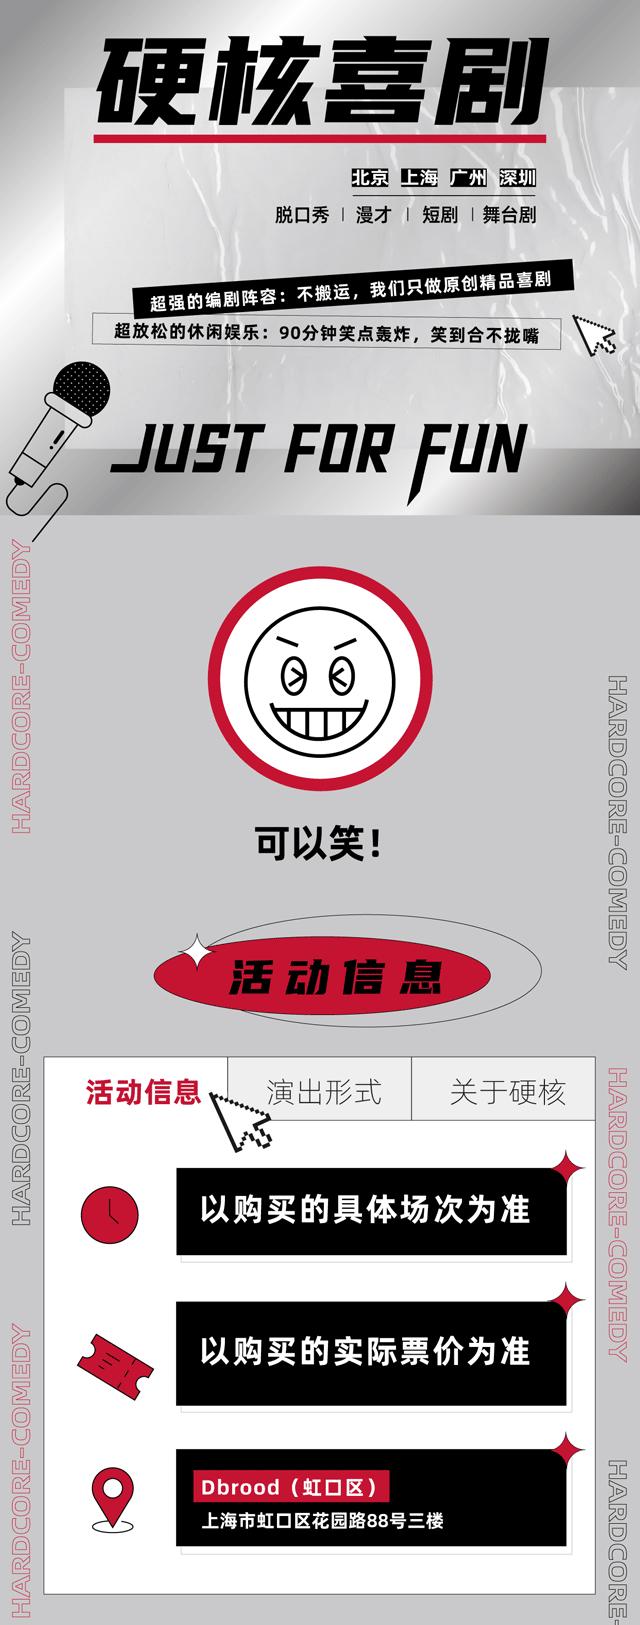 票务长图-上海(Dbrood)_01.png